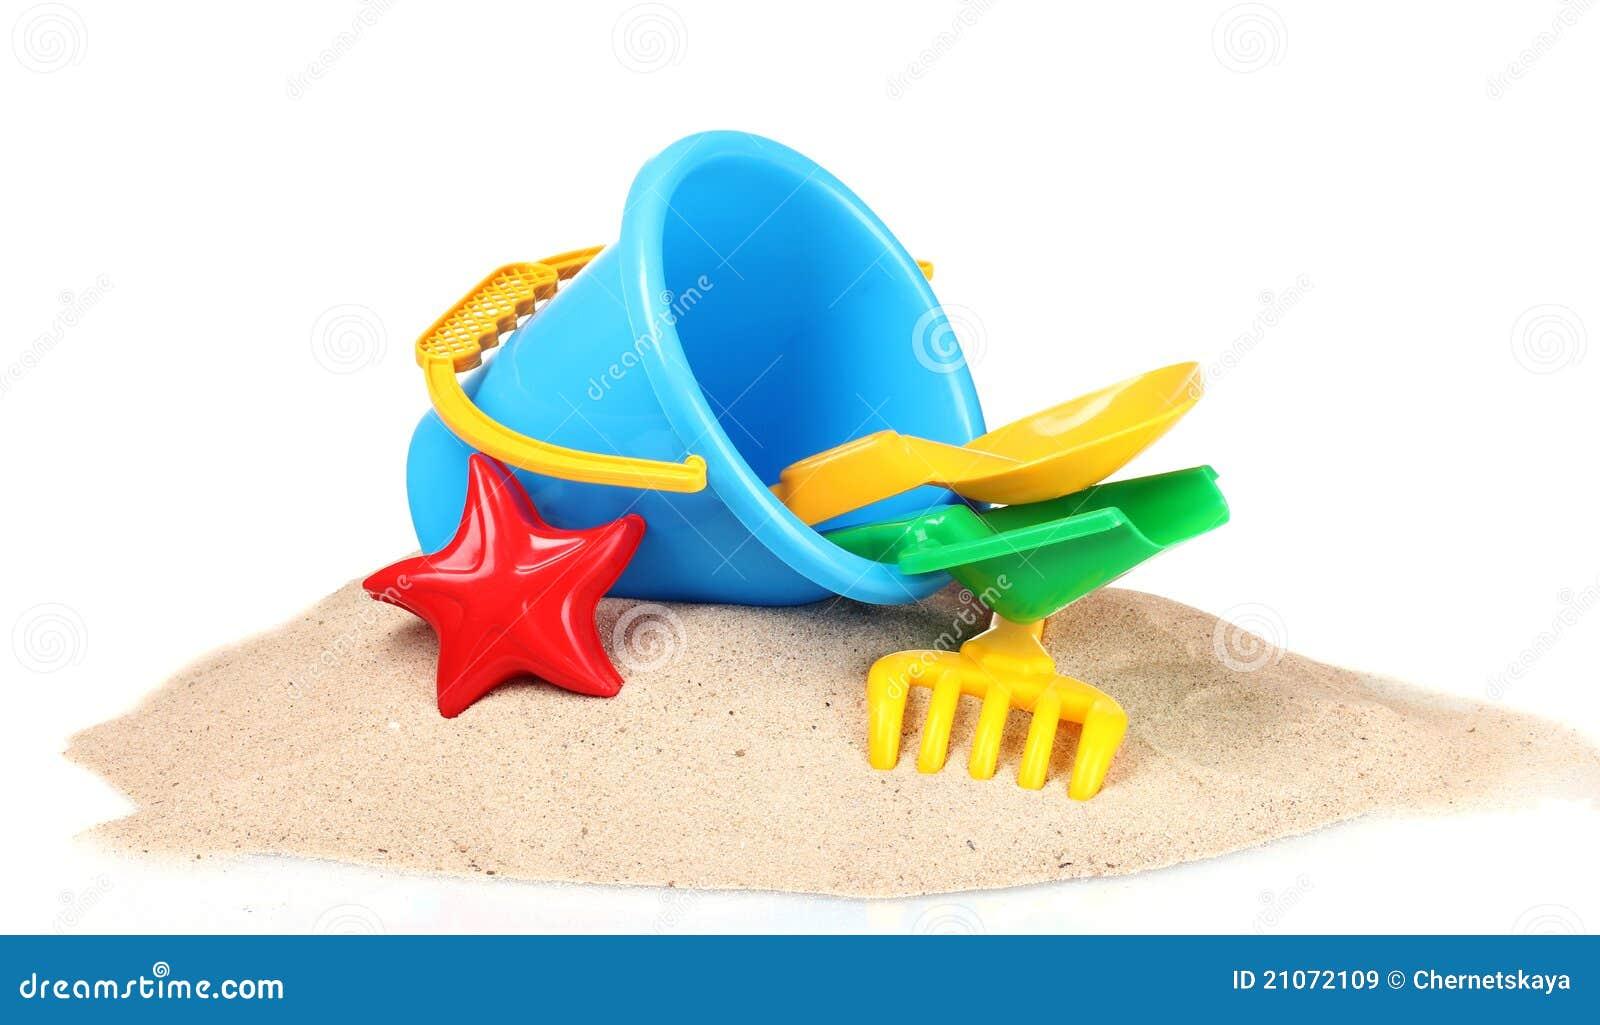 Toys For Beach : Children games at the beach stock photo cartoondealer